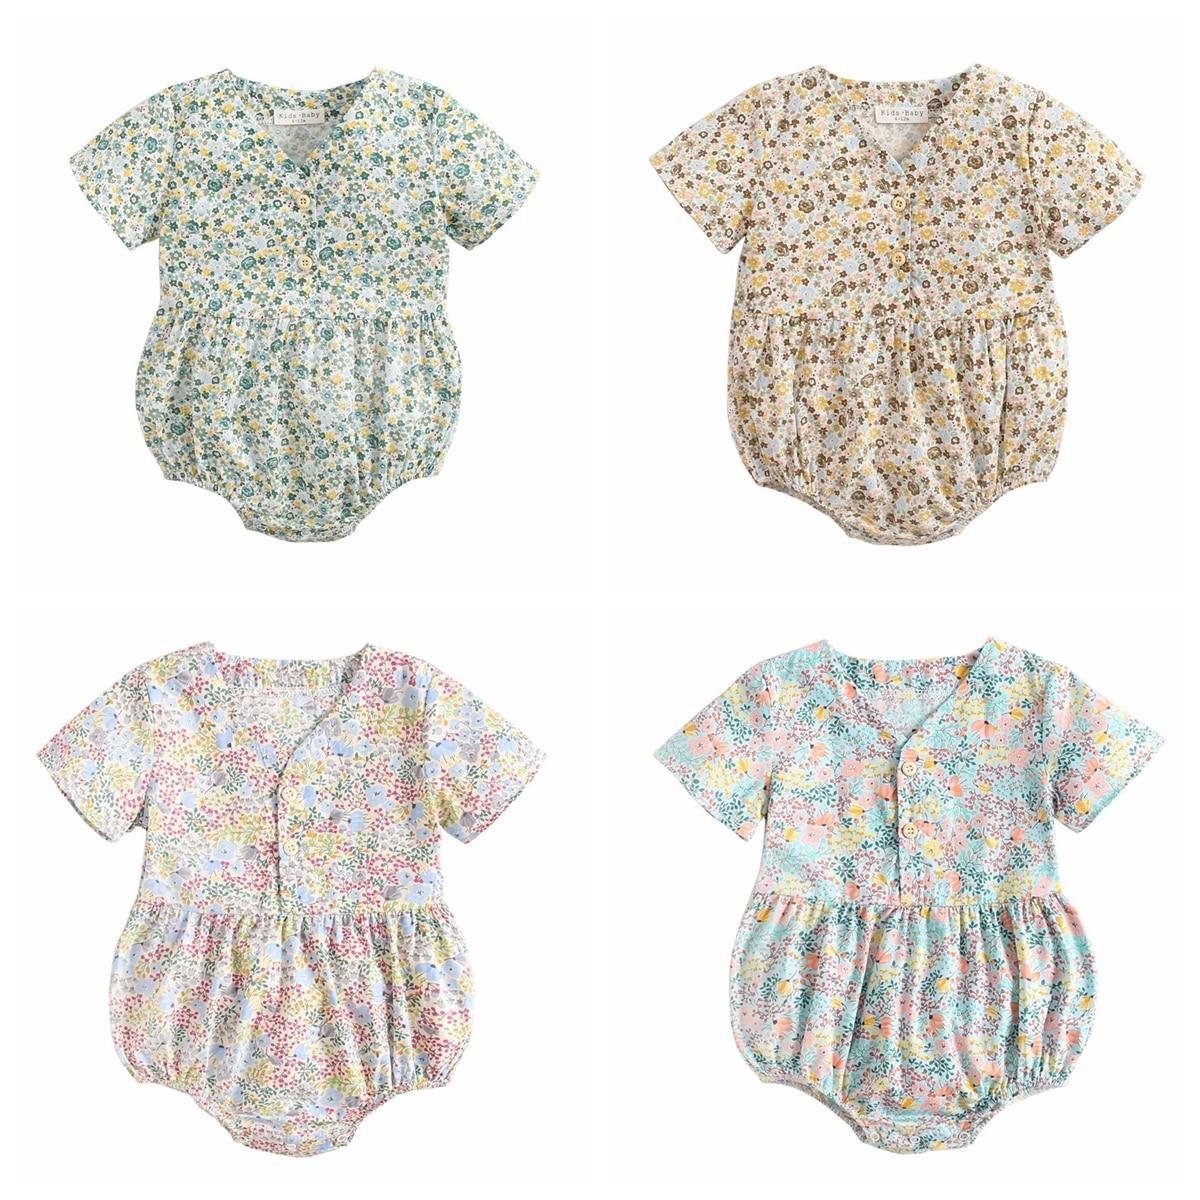 Sanlutoz Newborn Flowers Baby Girls Bodysuits Cotton Baby Bodysuit Short Sleeve Summer Infant Clothing Princess